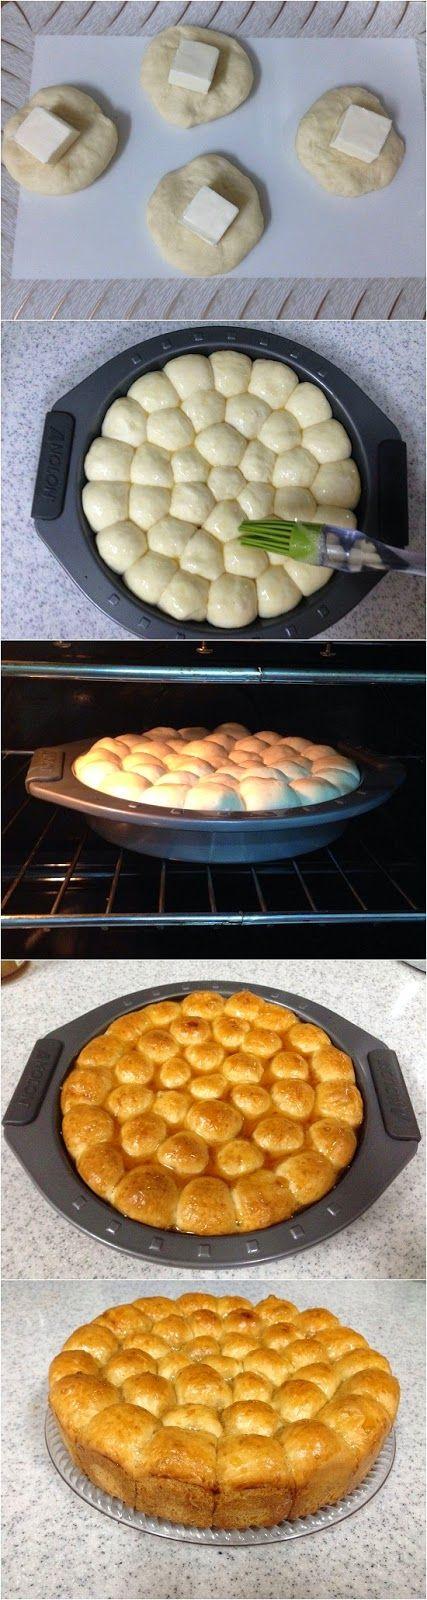 Honeycomb Bread